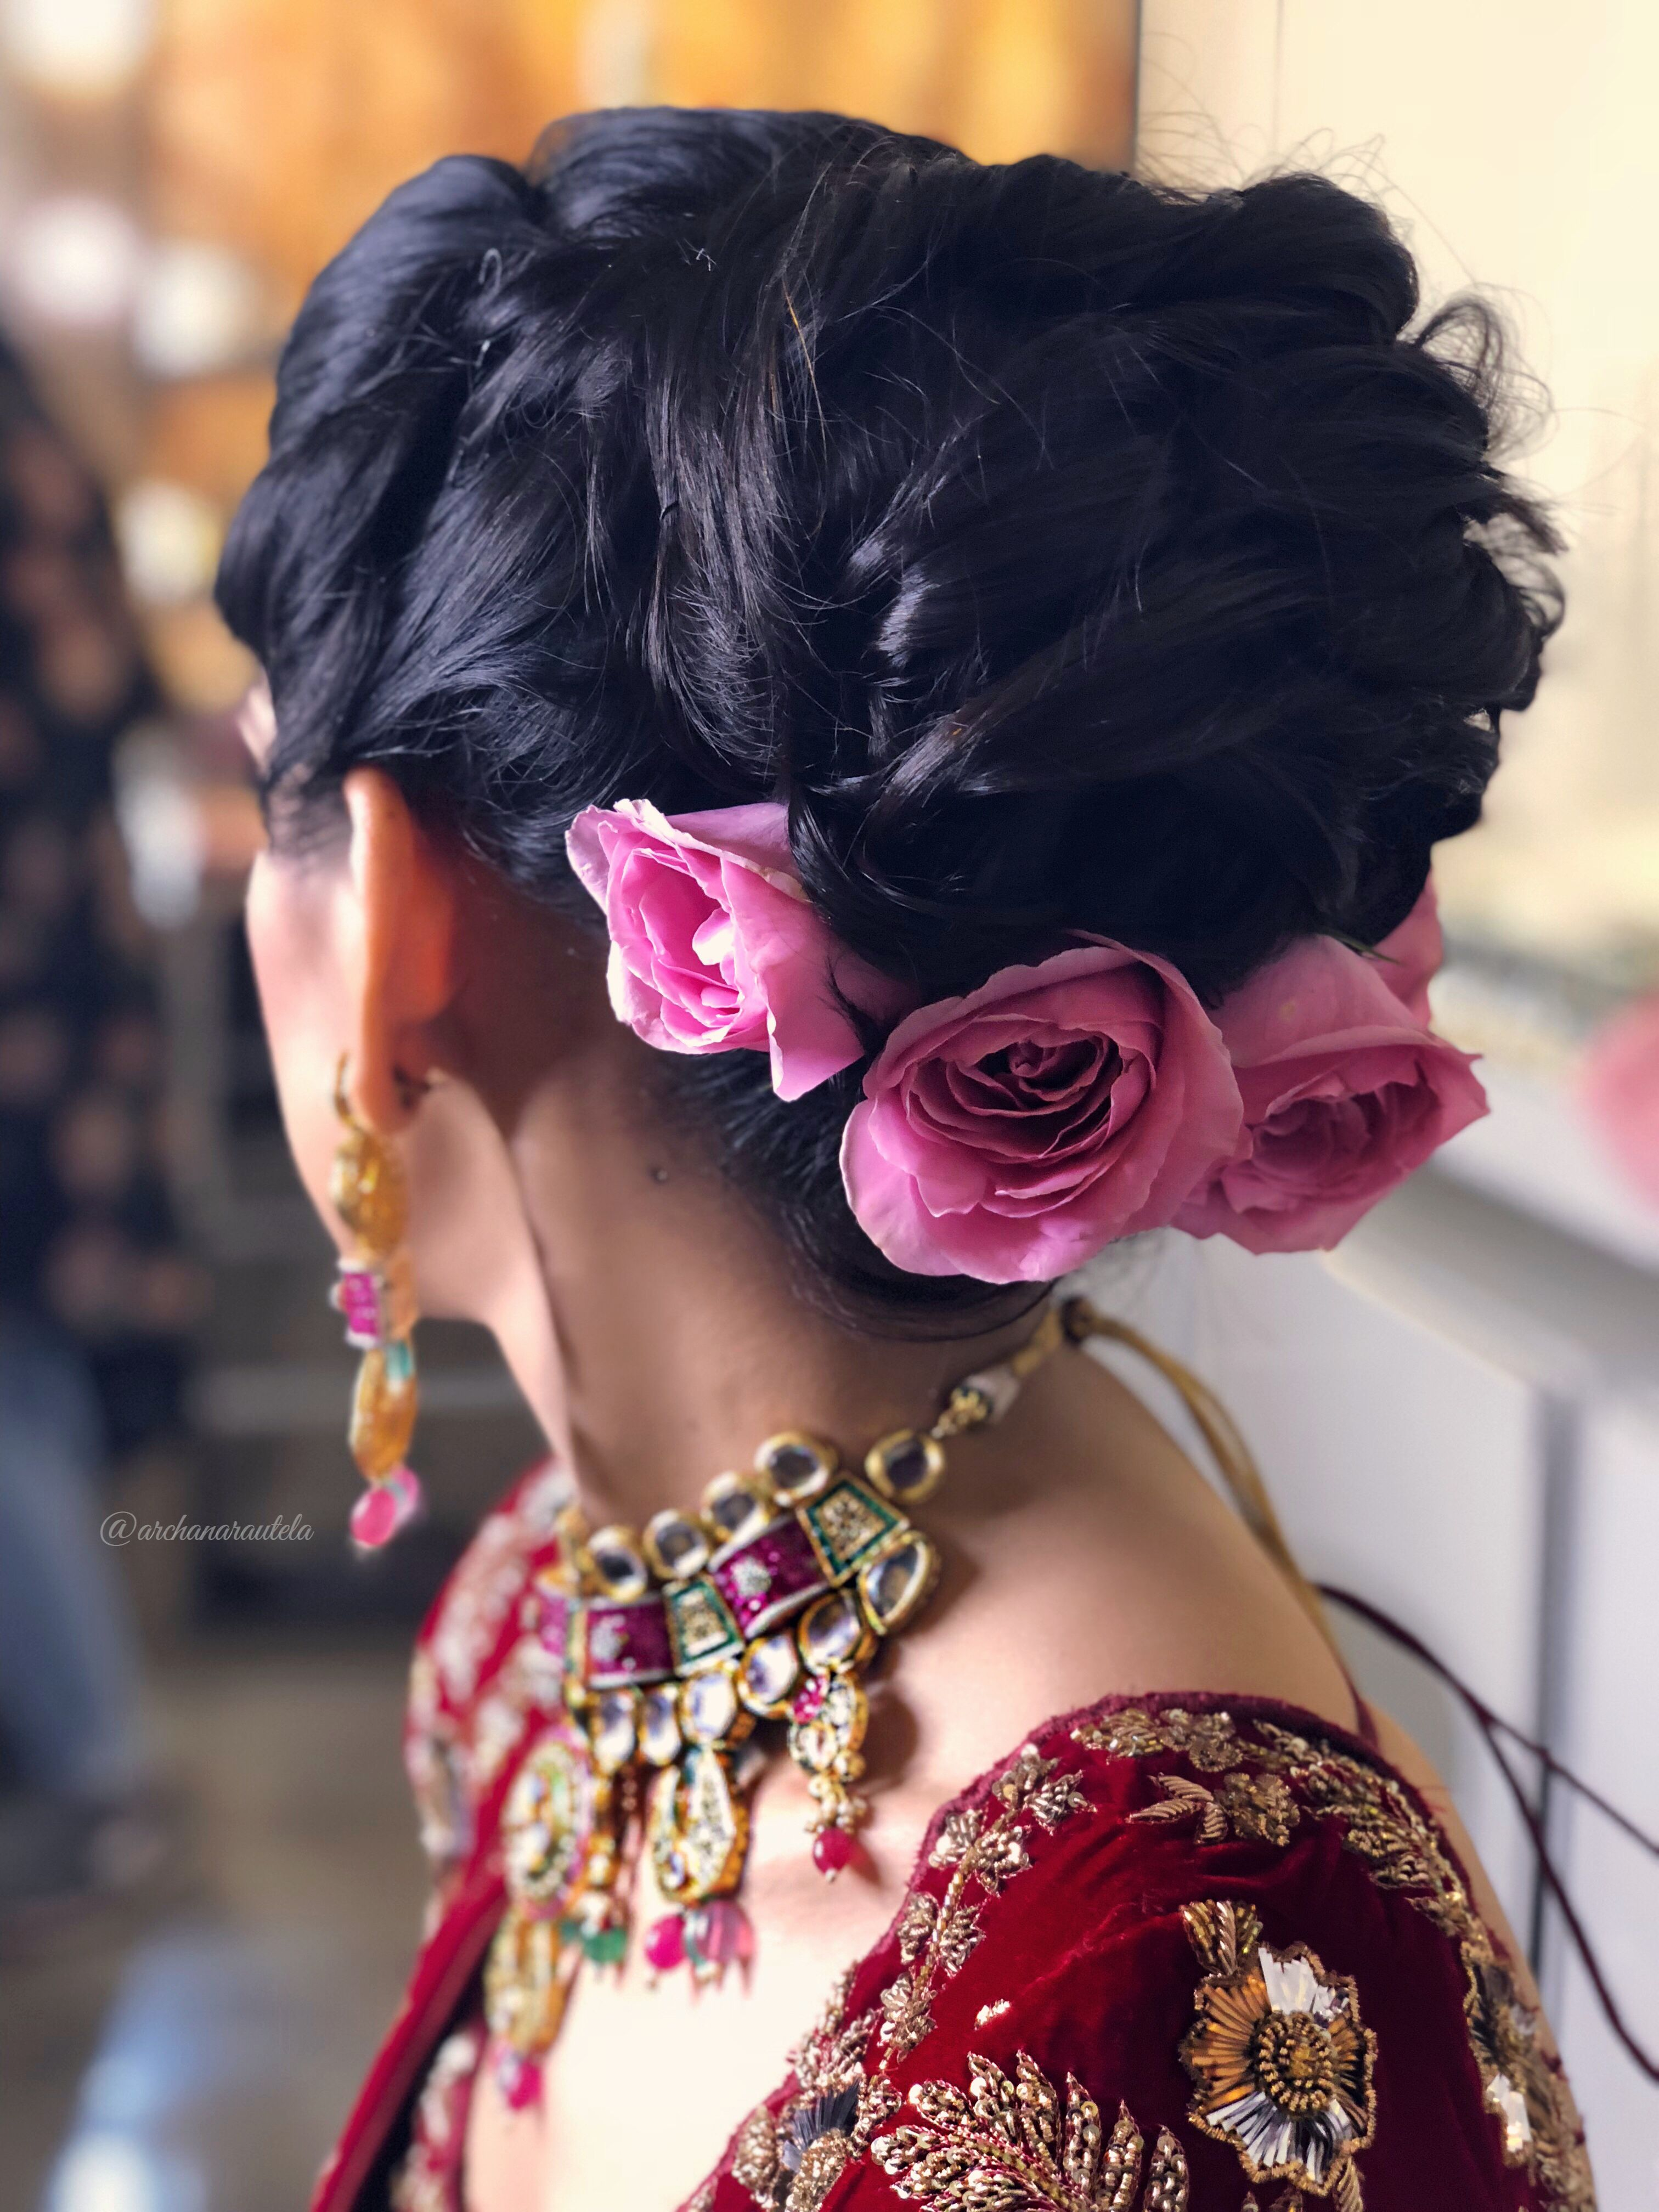 pink rose hair 🌷🌷🌷👰🏼🌷🌷🌷 bridal hairdo the